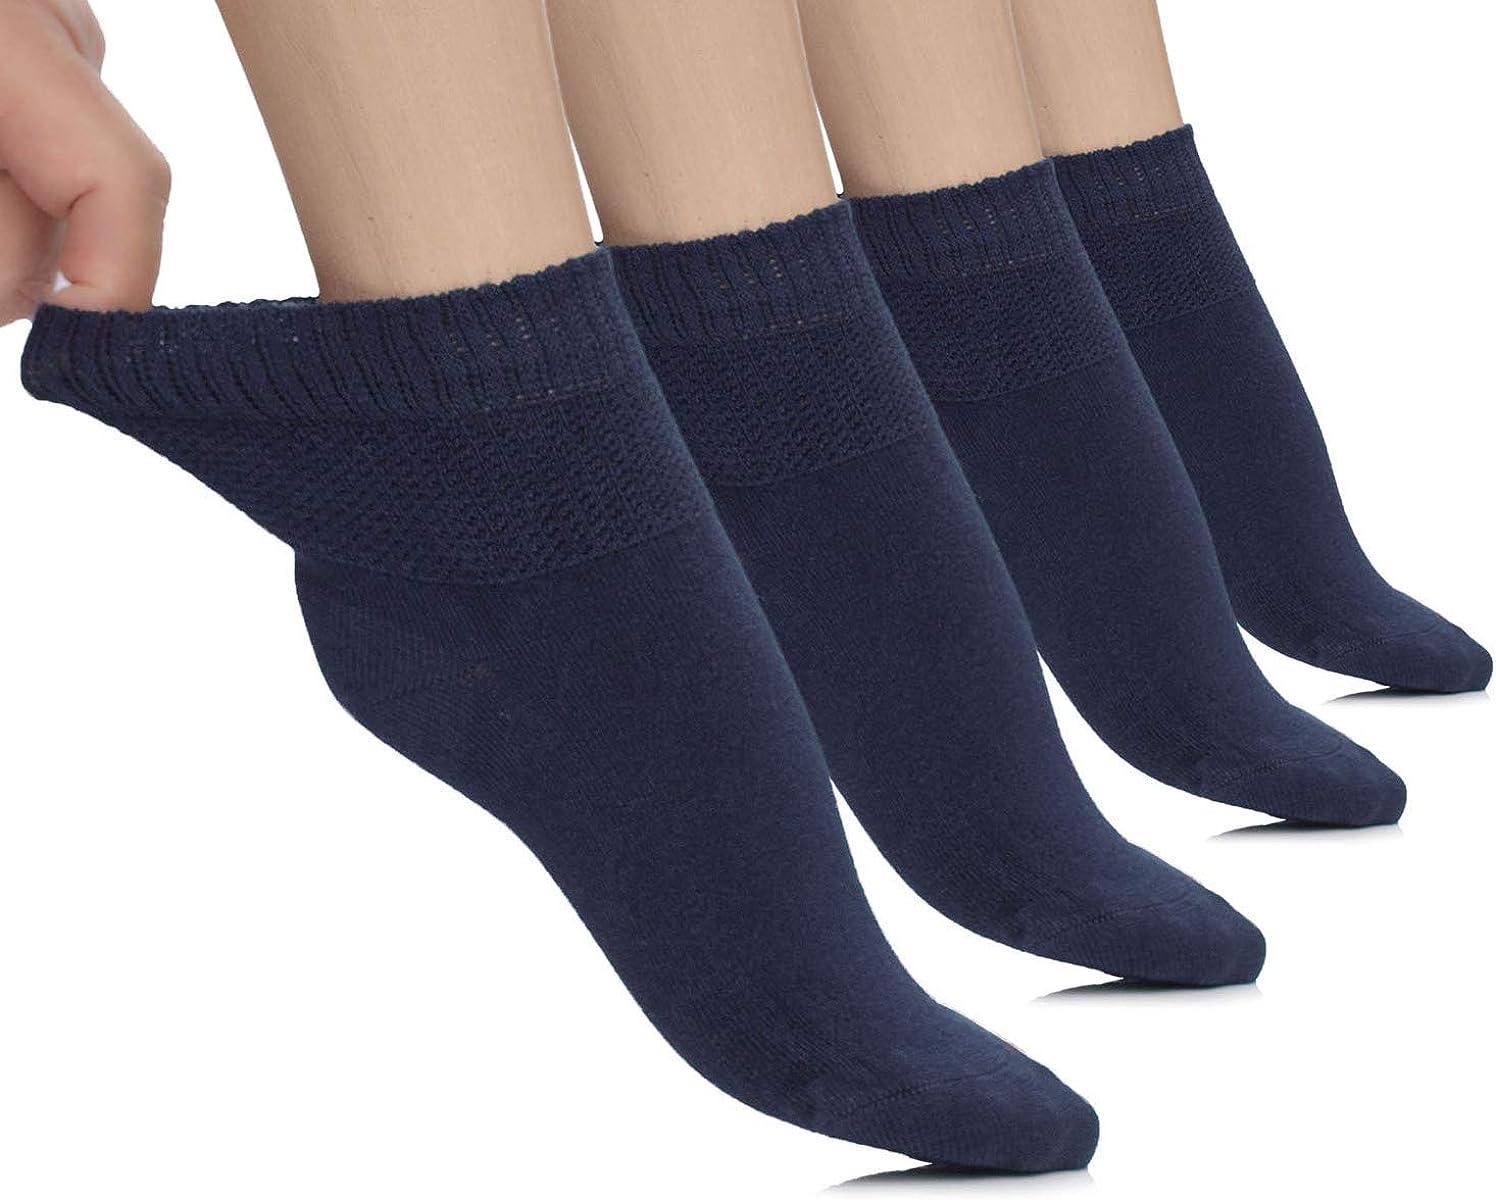 Hugh Ugoli Lightweight Women'S Diabetic Ankle Socks Bamboo Thin Socks Seamless Toe und Non-Binding Top, 4 Pairs